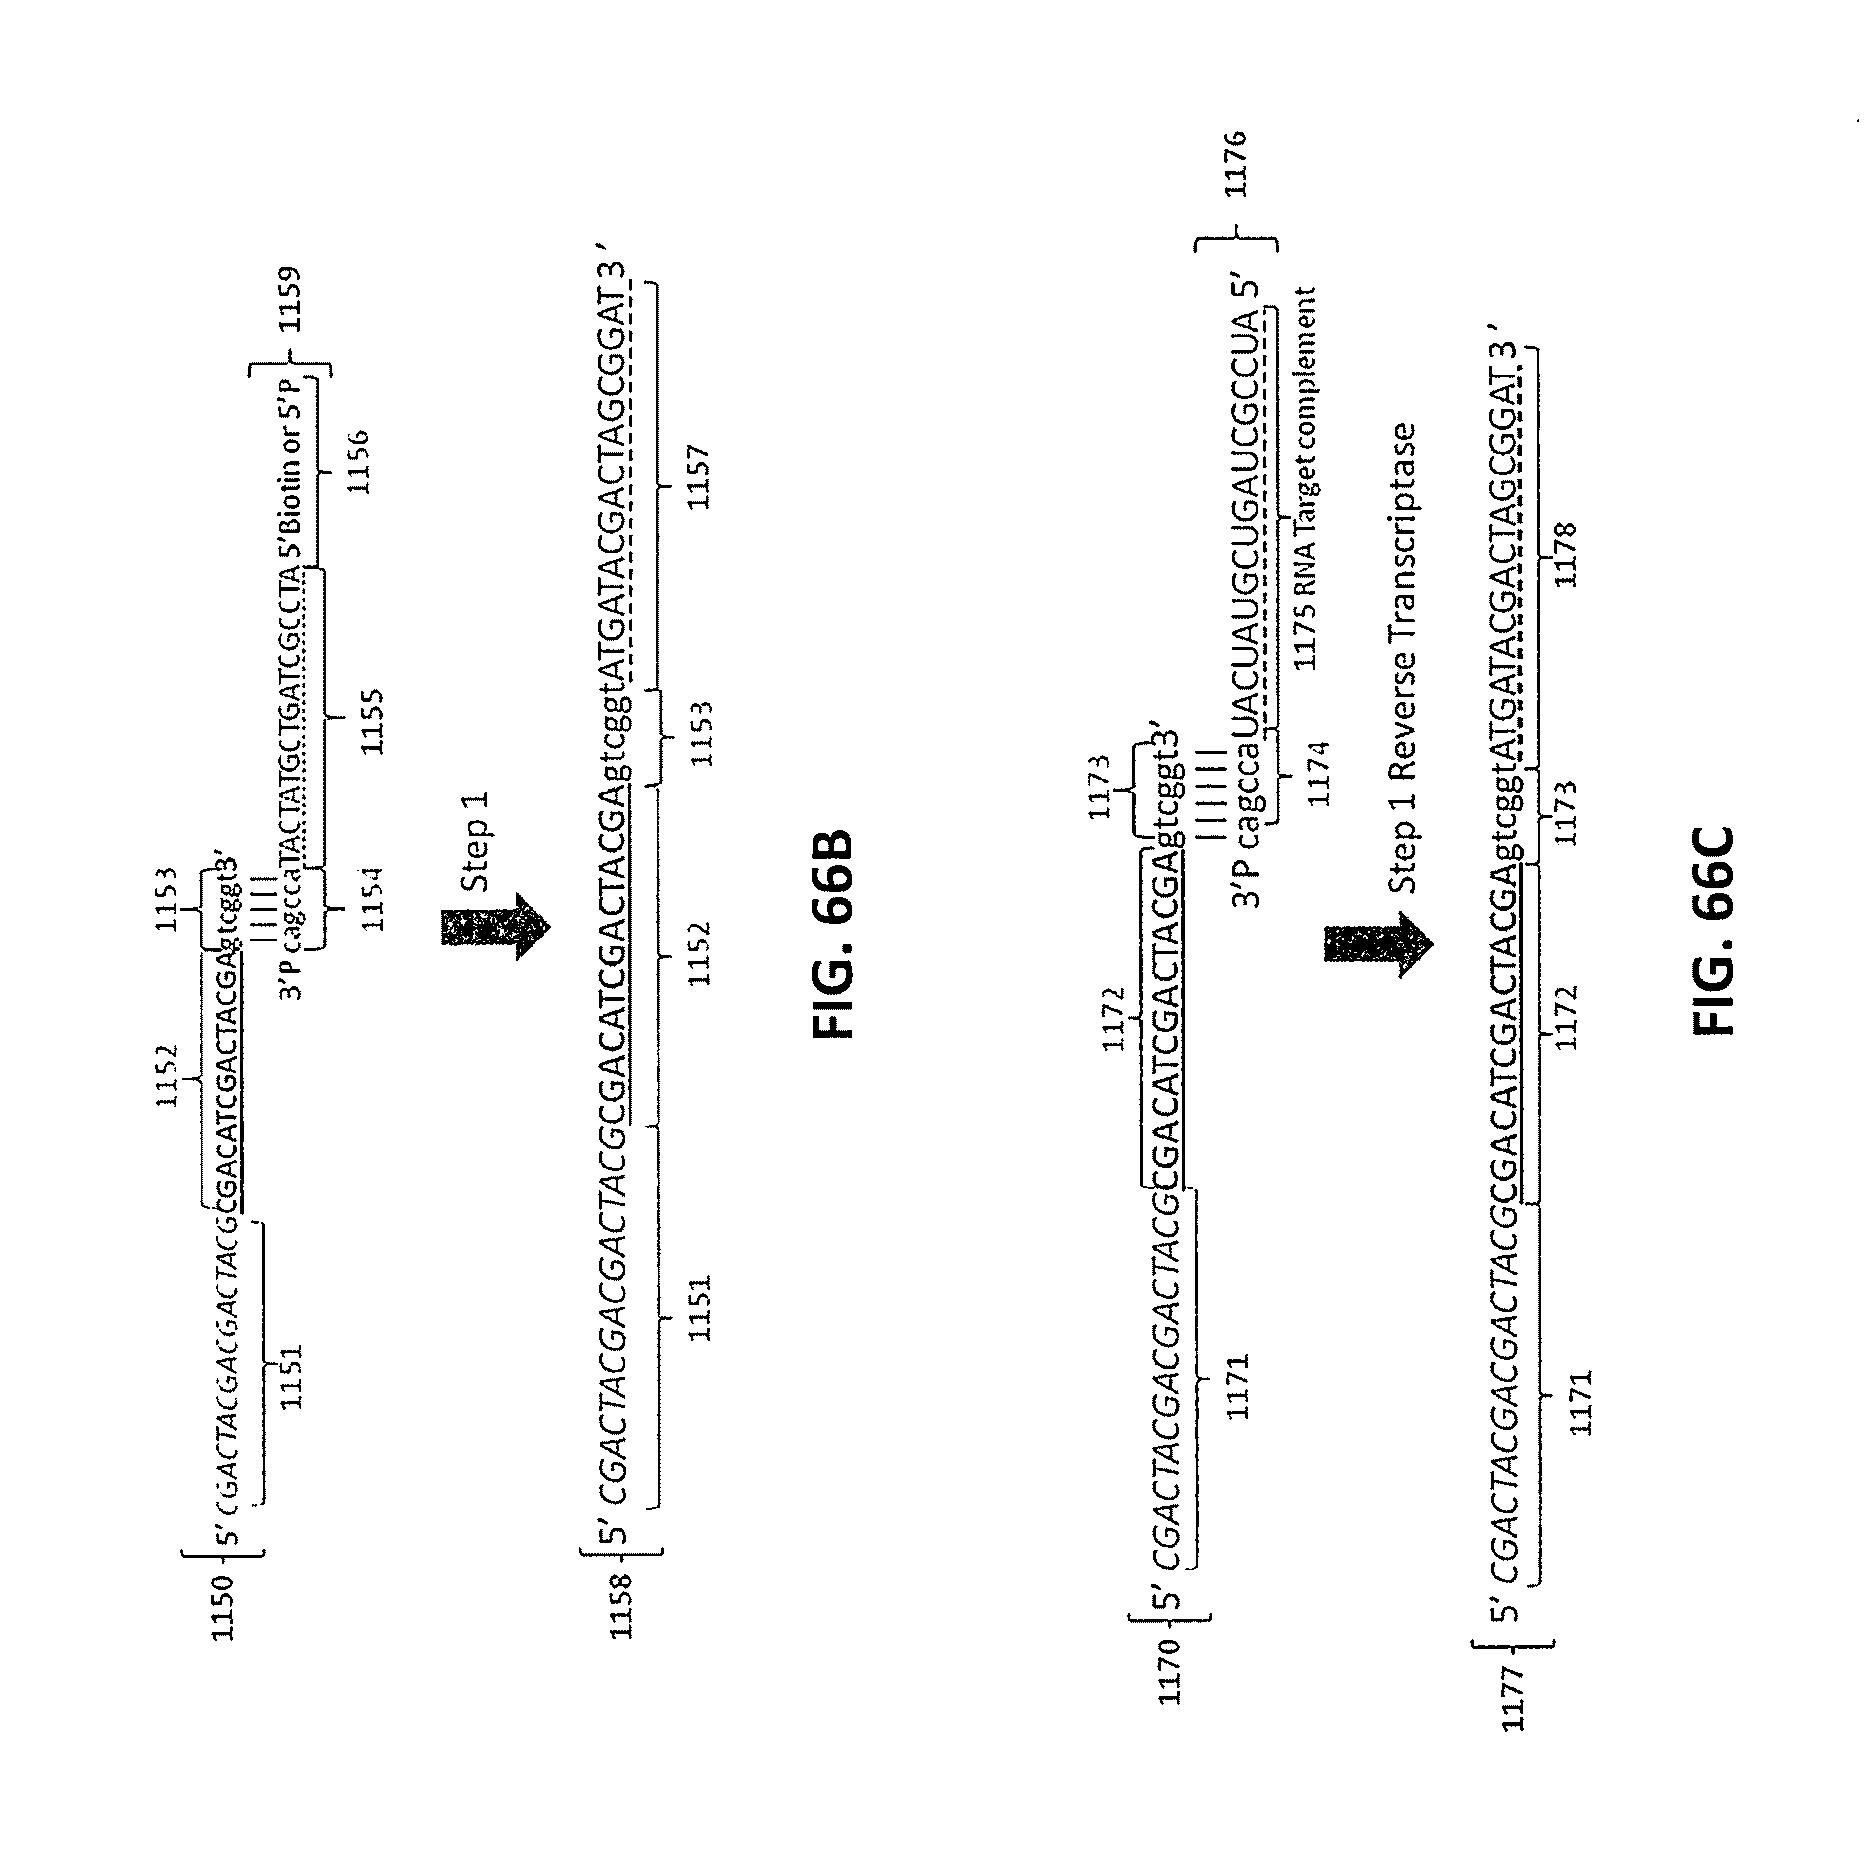 Patent US 9,567,645 B2